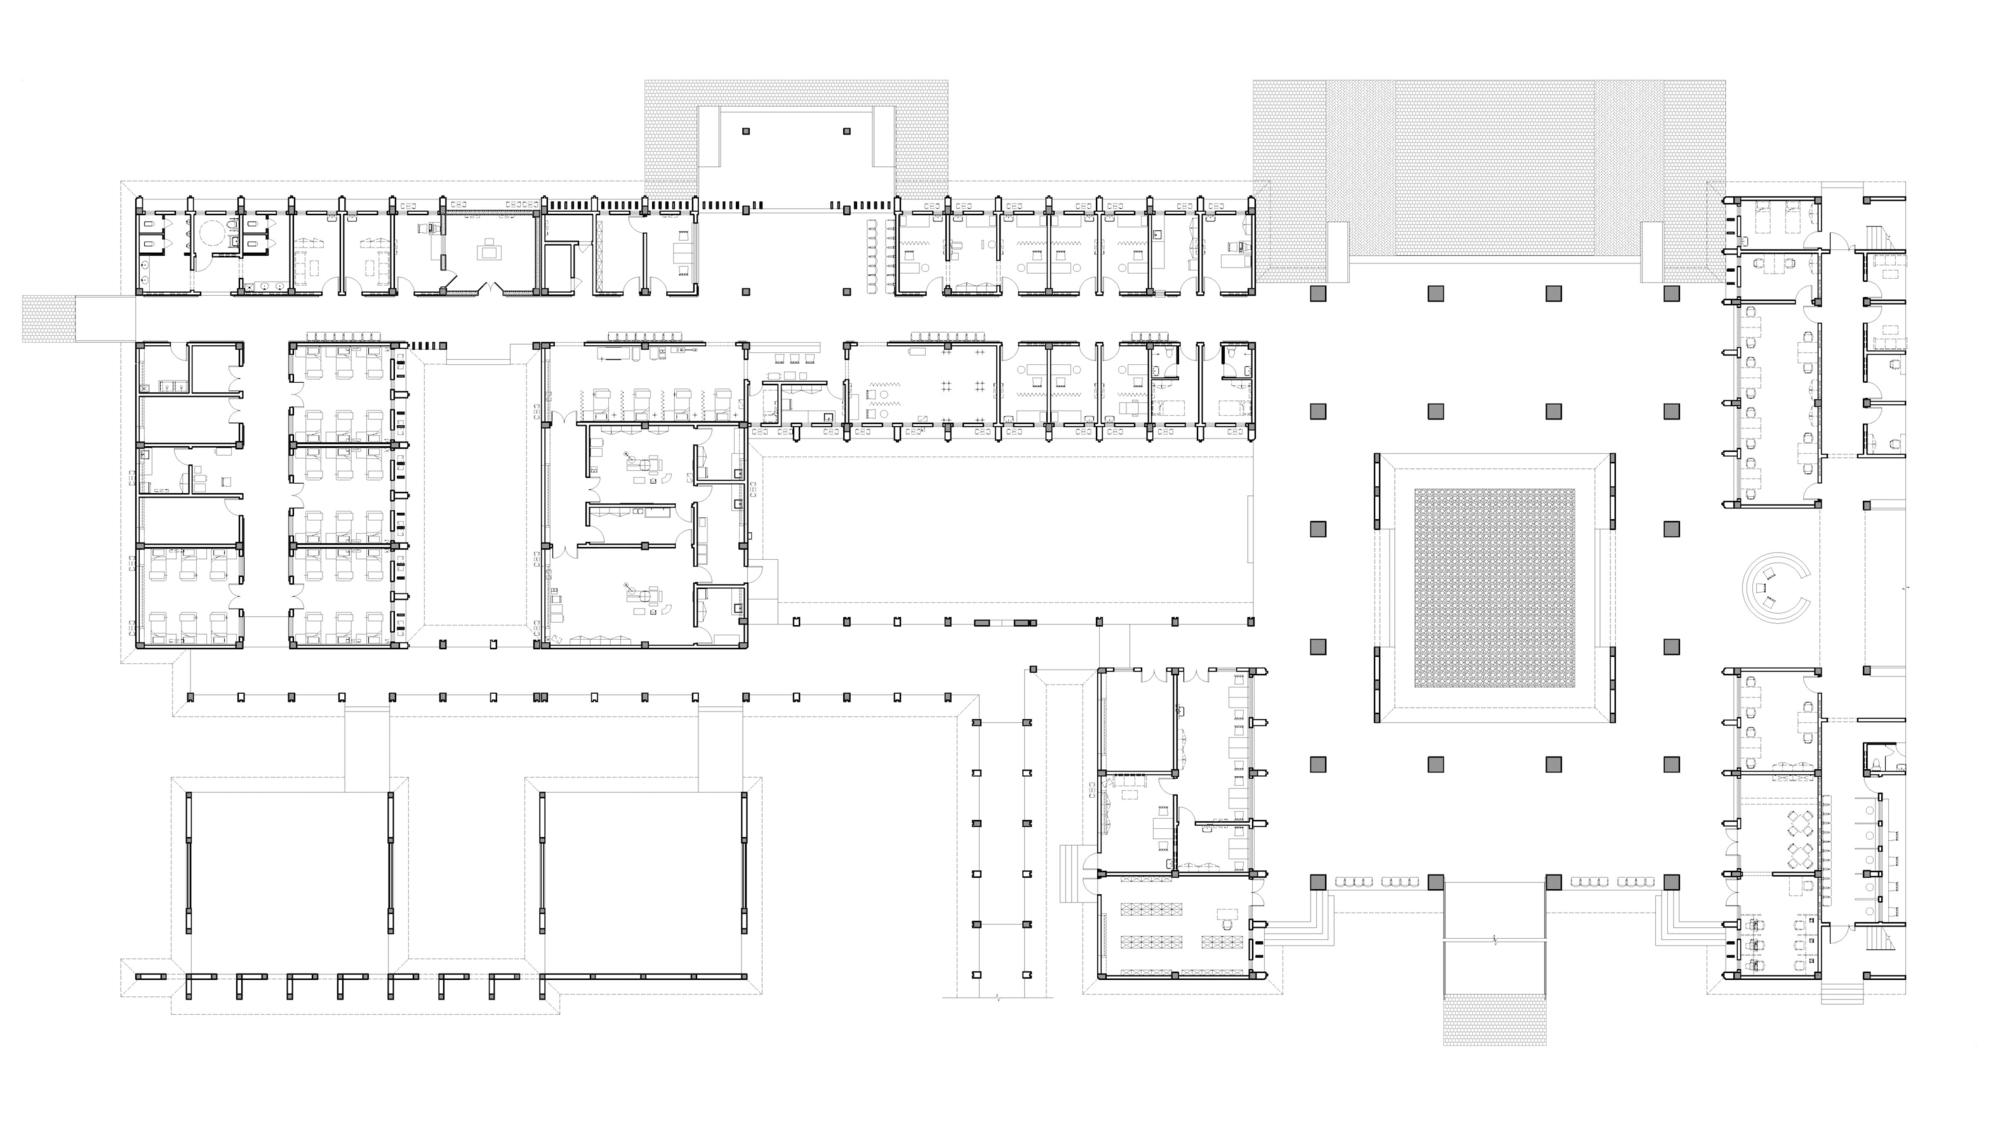 general hospital of niger cadi ground floor plan  [ 2000 x 1124 Pixel ]